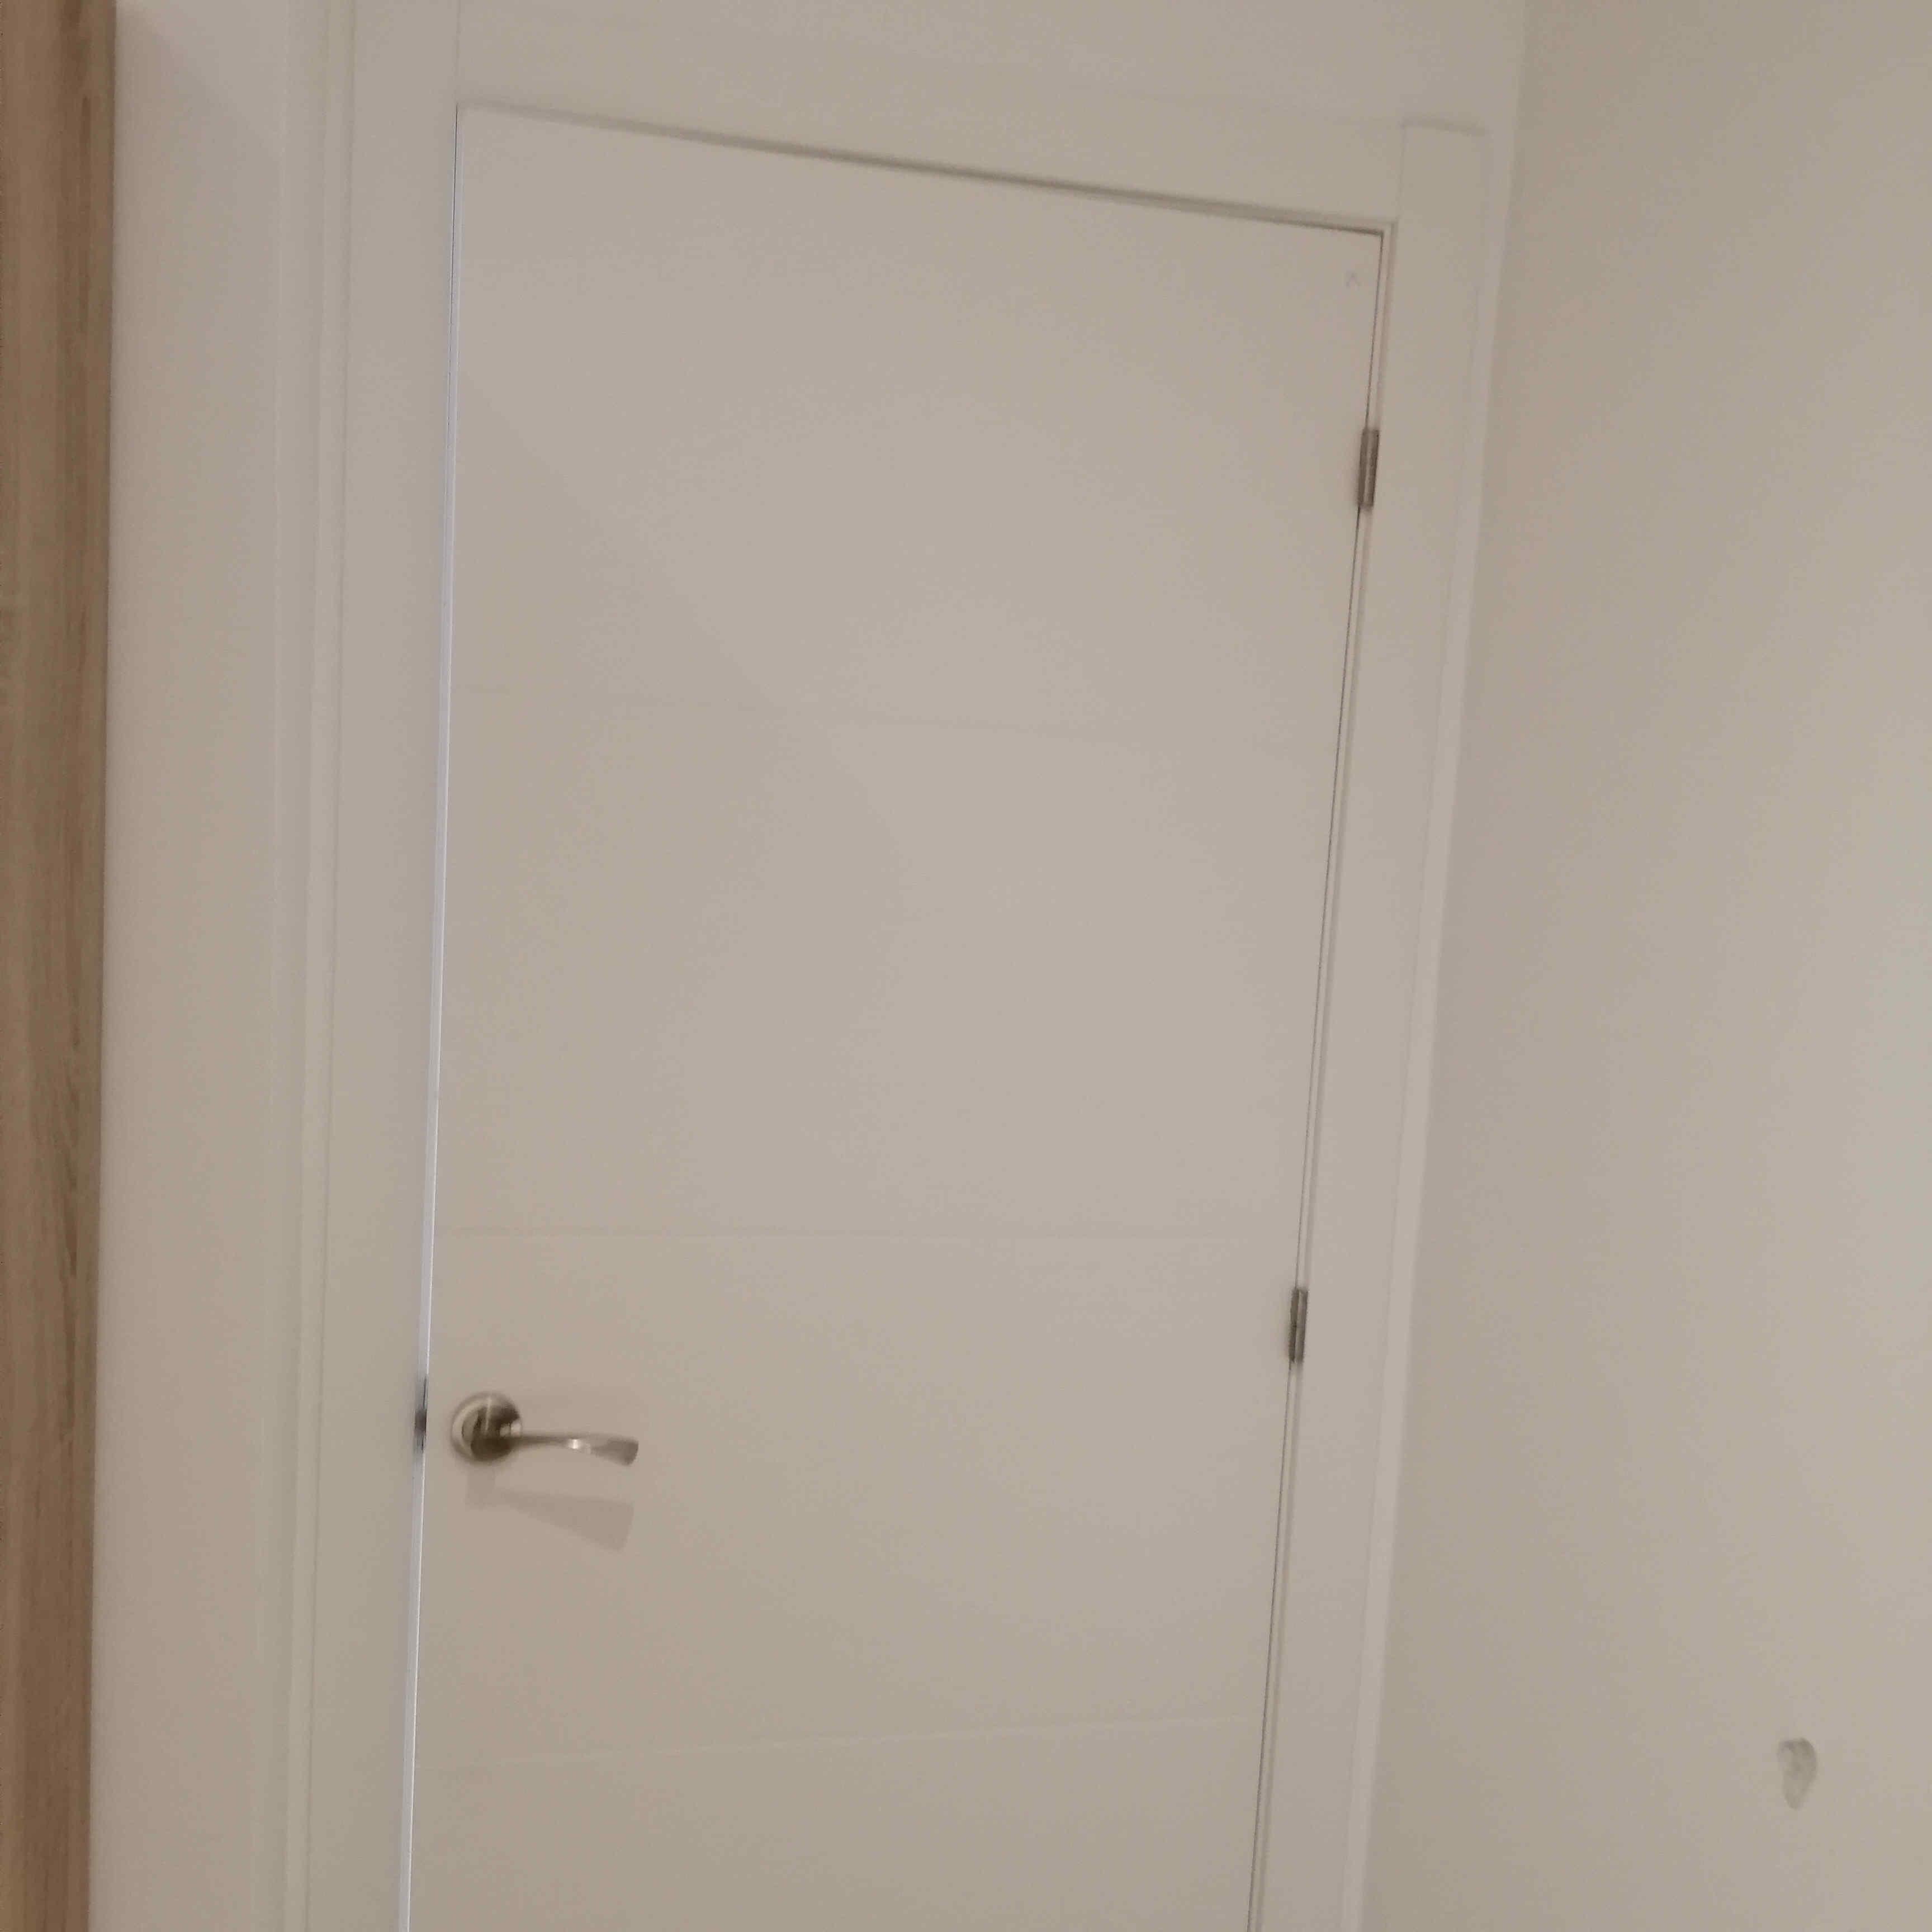 carpinteria-de-madera-orihuela-costa-puertas-de-paso-dm-blanco